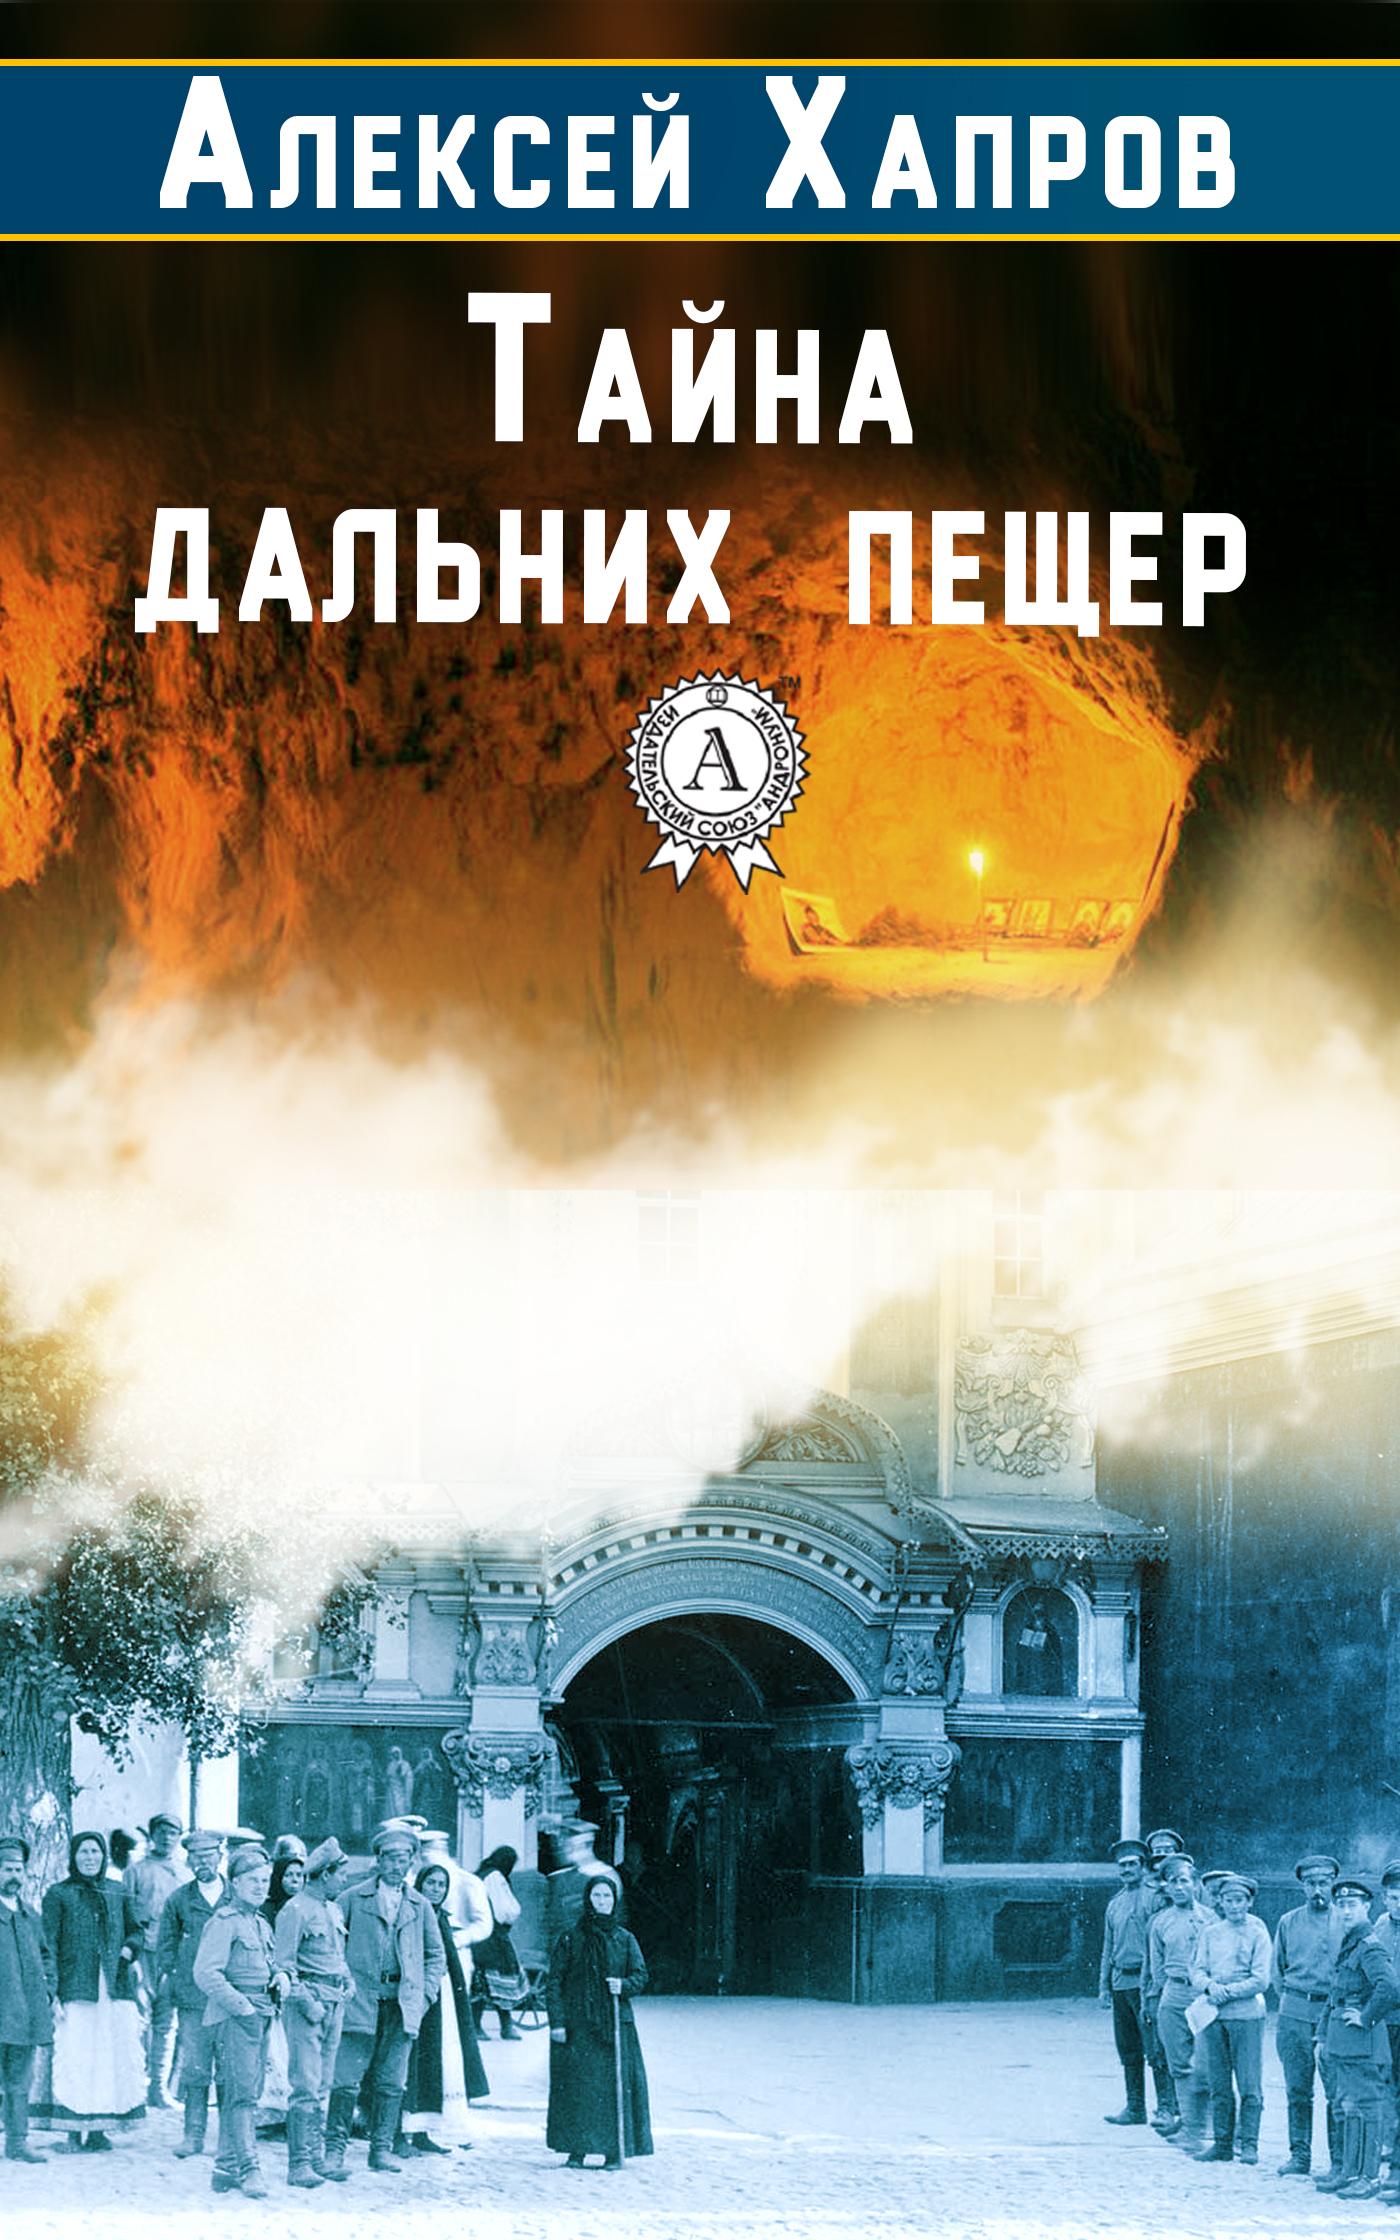 Алексей Викторович Хапров Тайна дальних пещер цена и фото